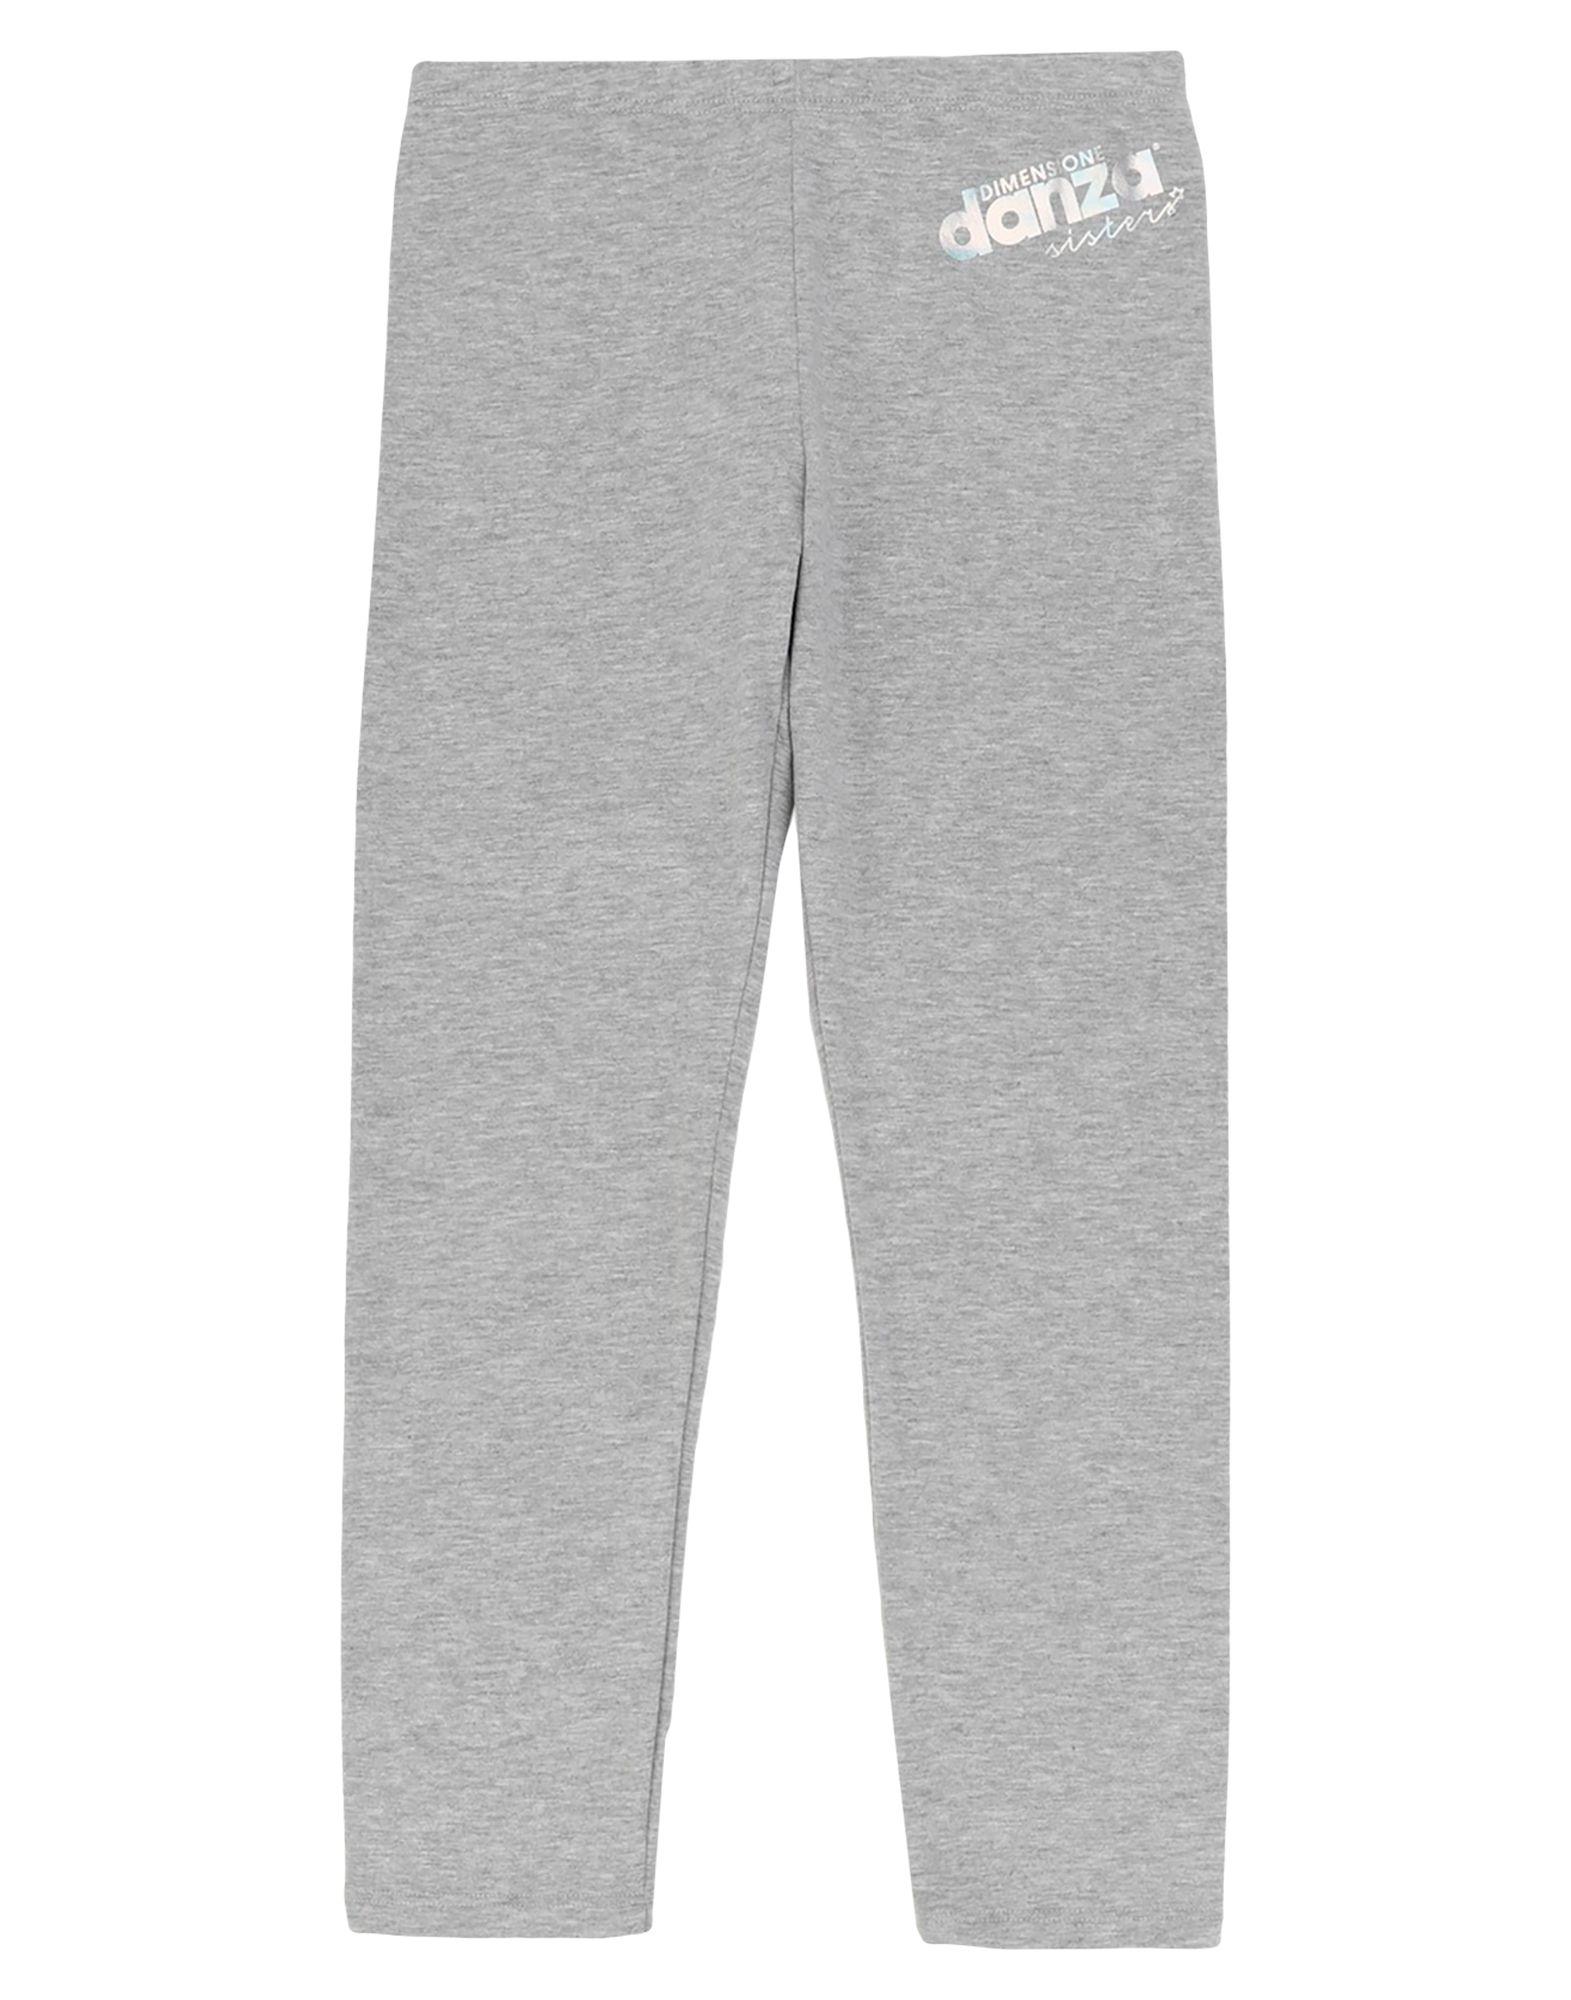 Dimensione Danza Sisters Kids' Leggings In Grey